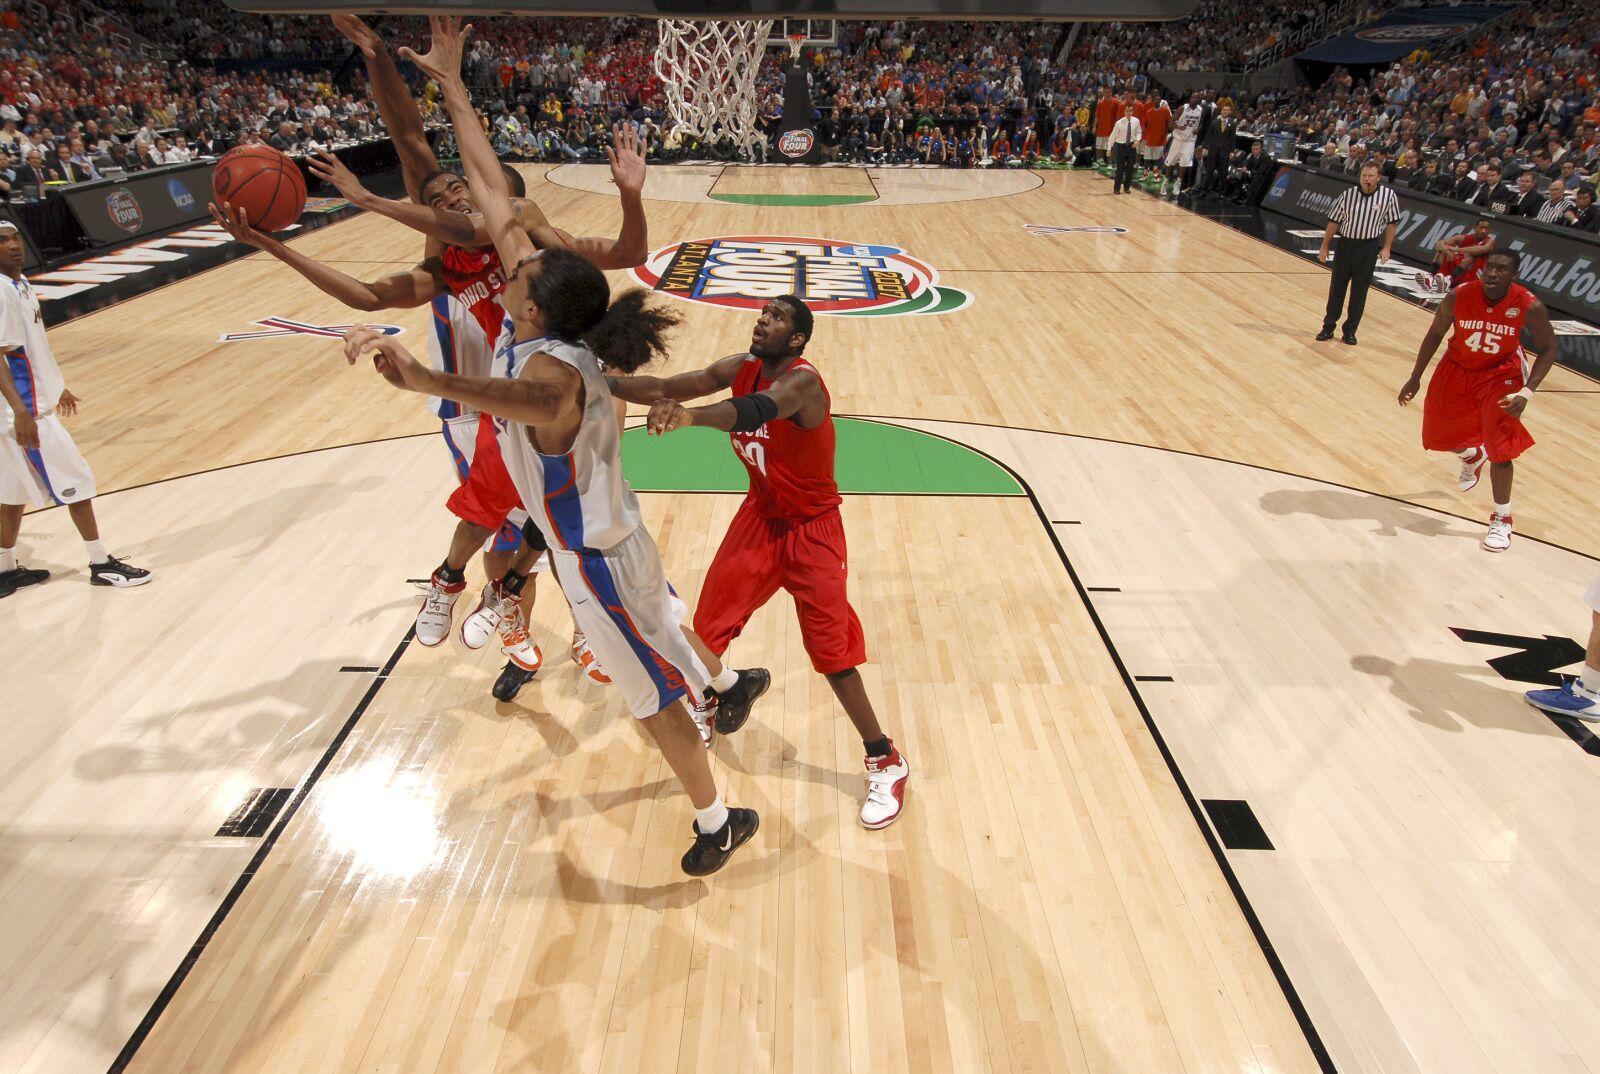 5d7c6fa3072 Memphis Grizzlies: Mike Conley, Joakim Noah Share Special NCAA Championship  Connection